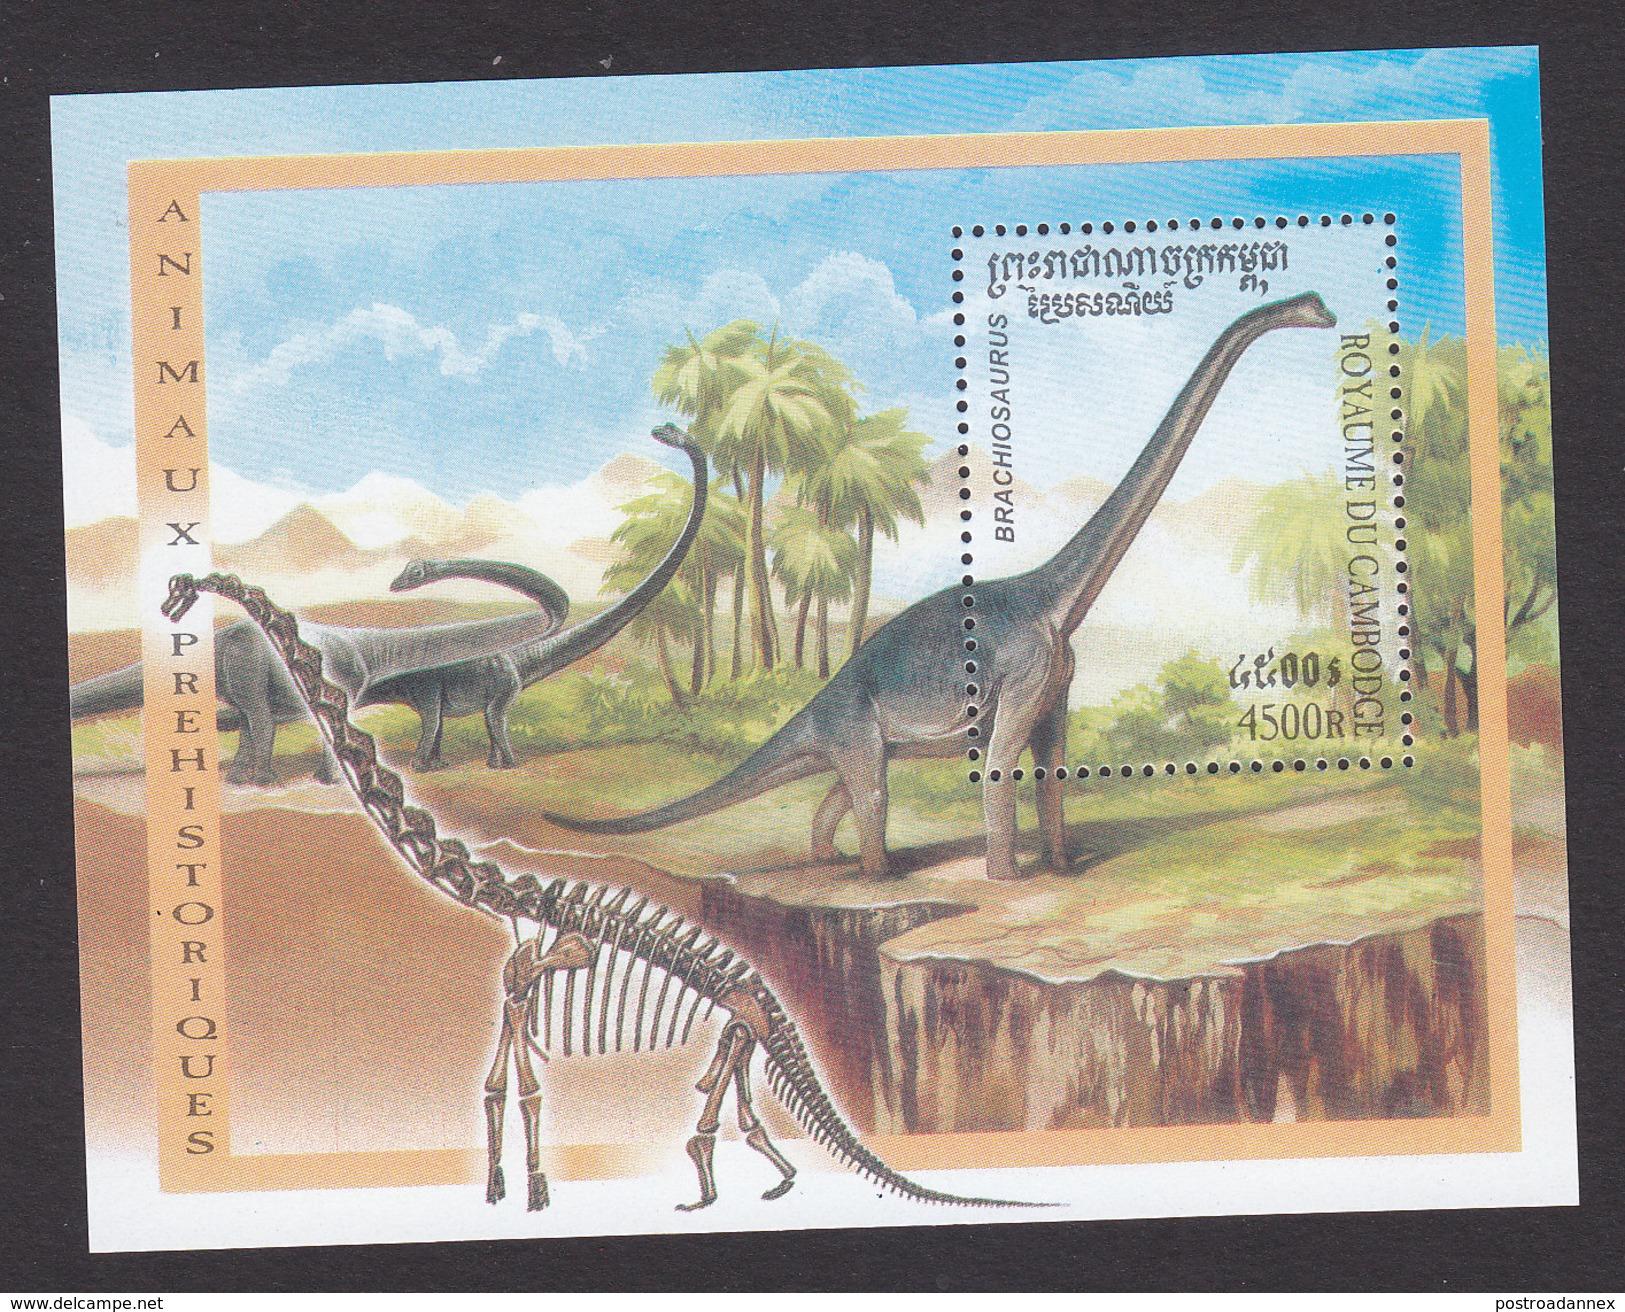 Cambodia, Scott #1930, Mint Hinged, Dinosaurs, Issued 2000 - Cambodja